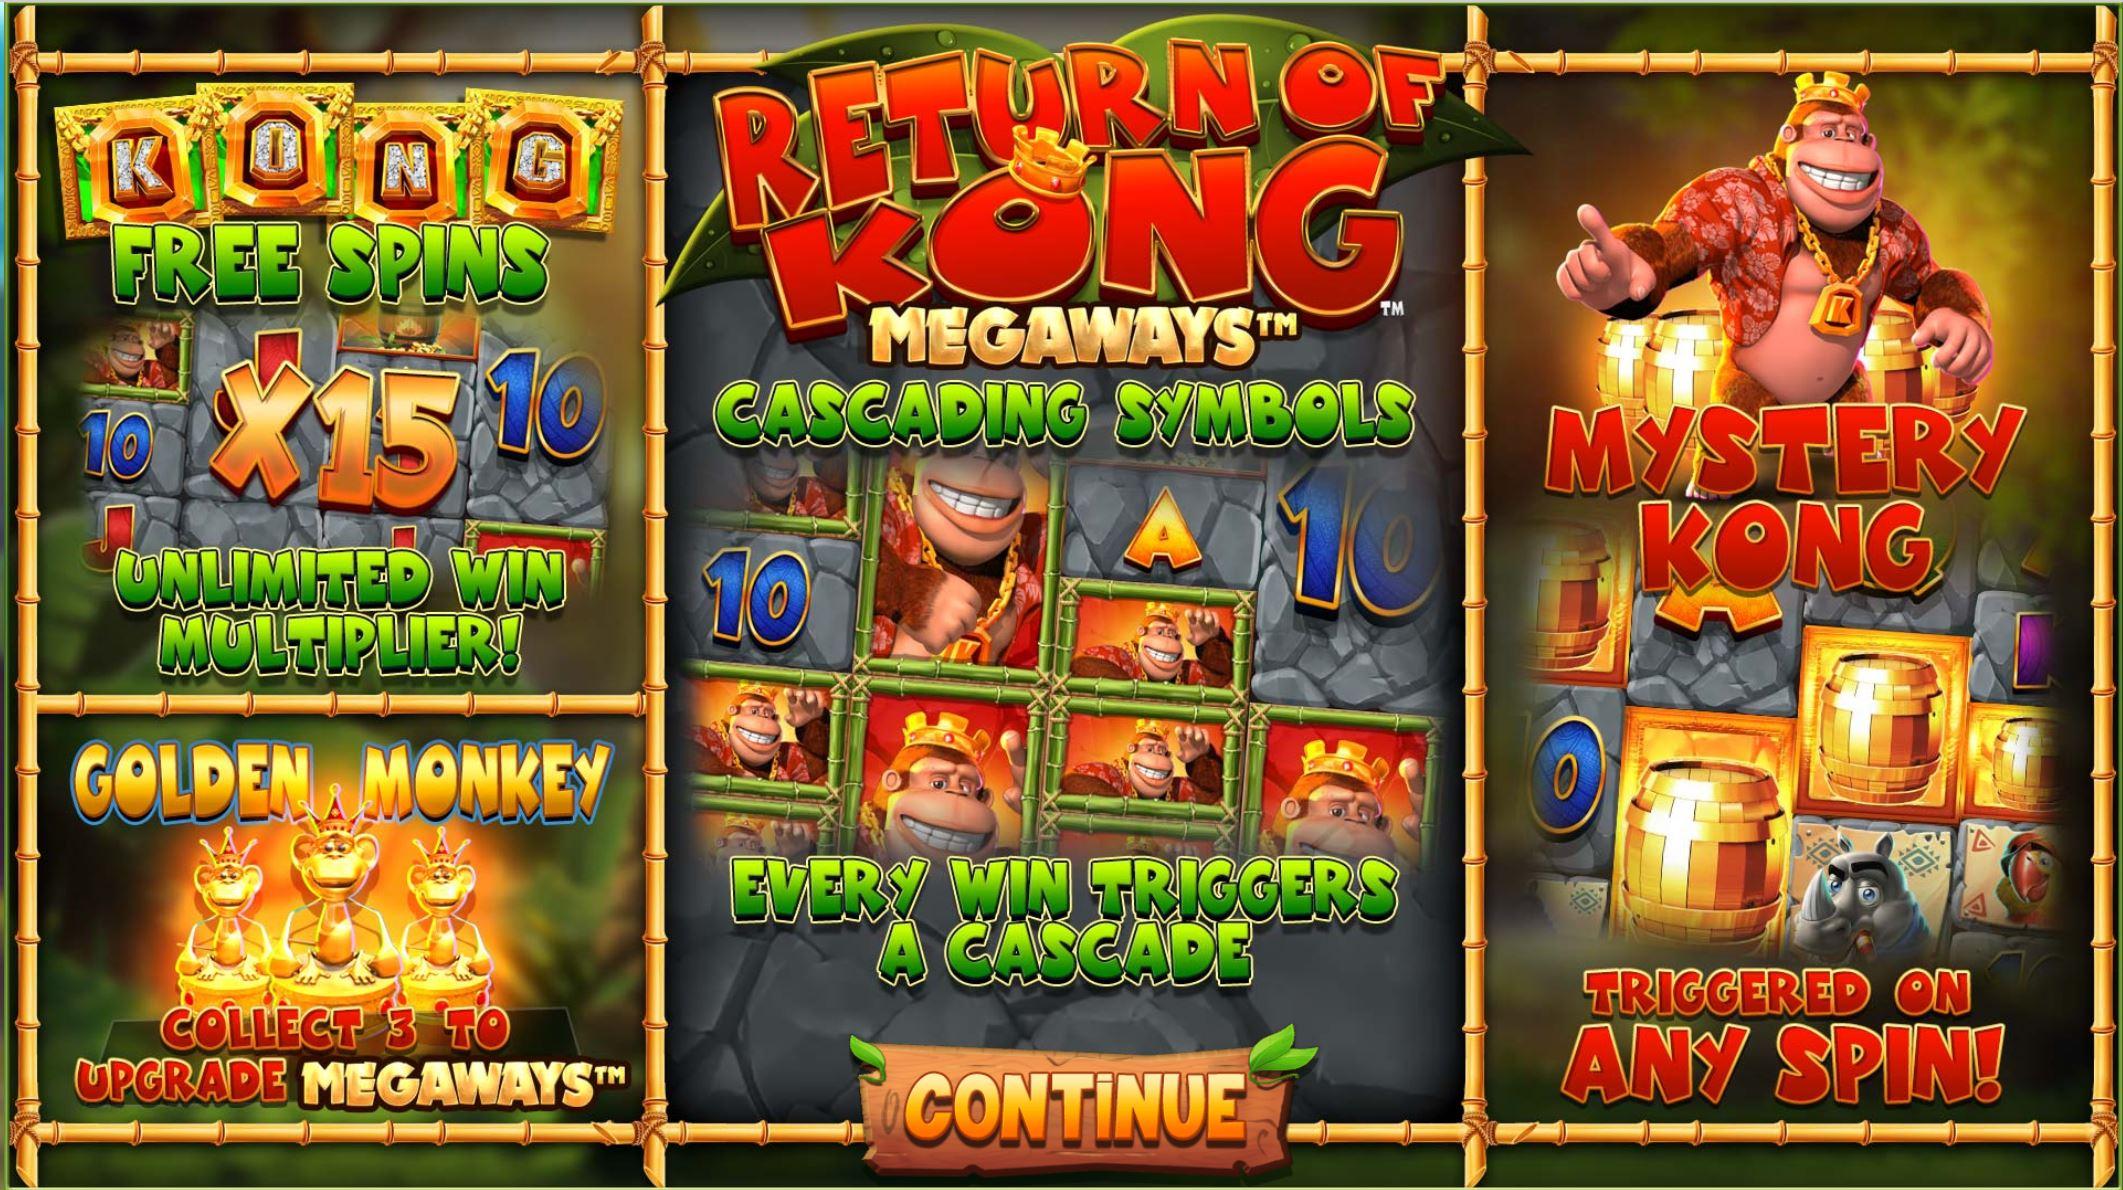 Return of Kong megaways info